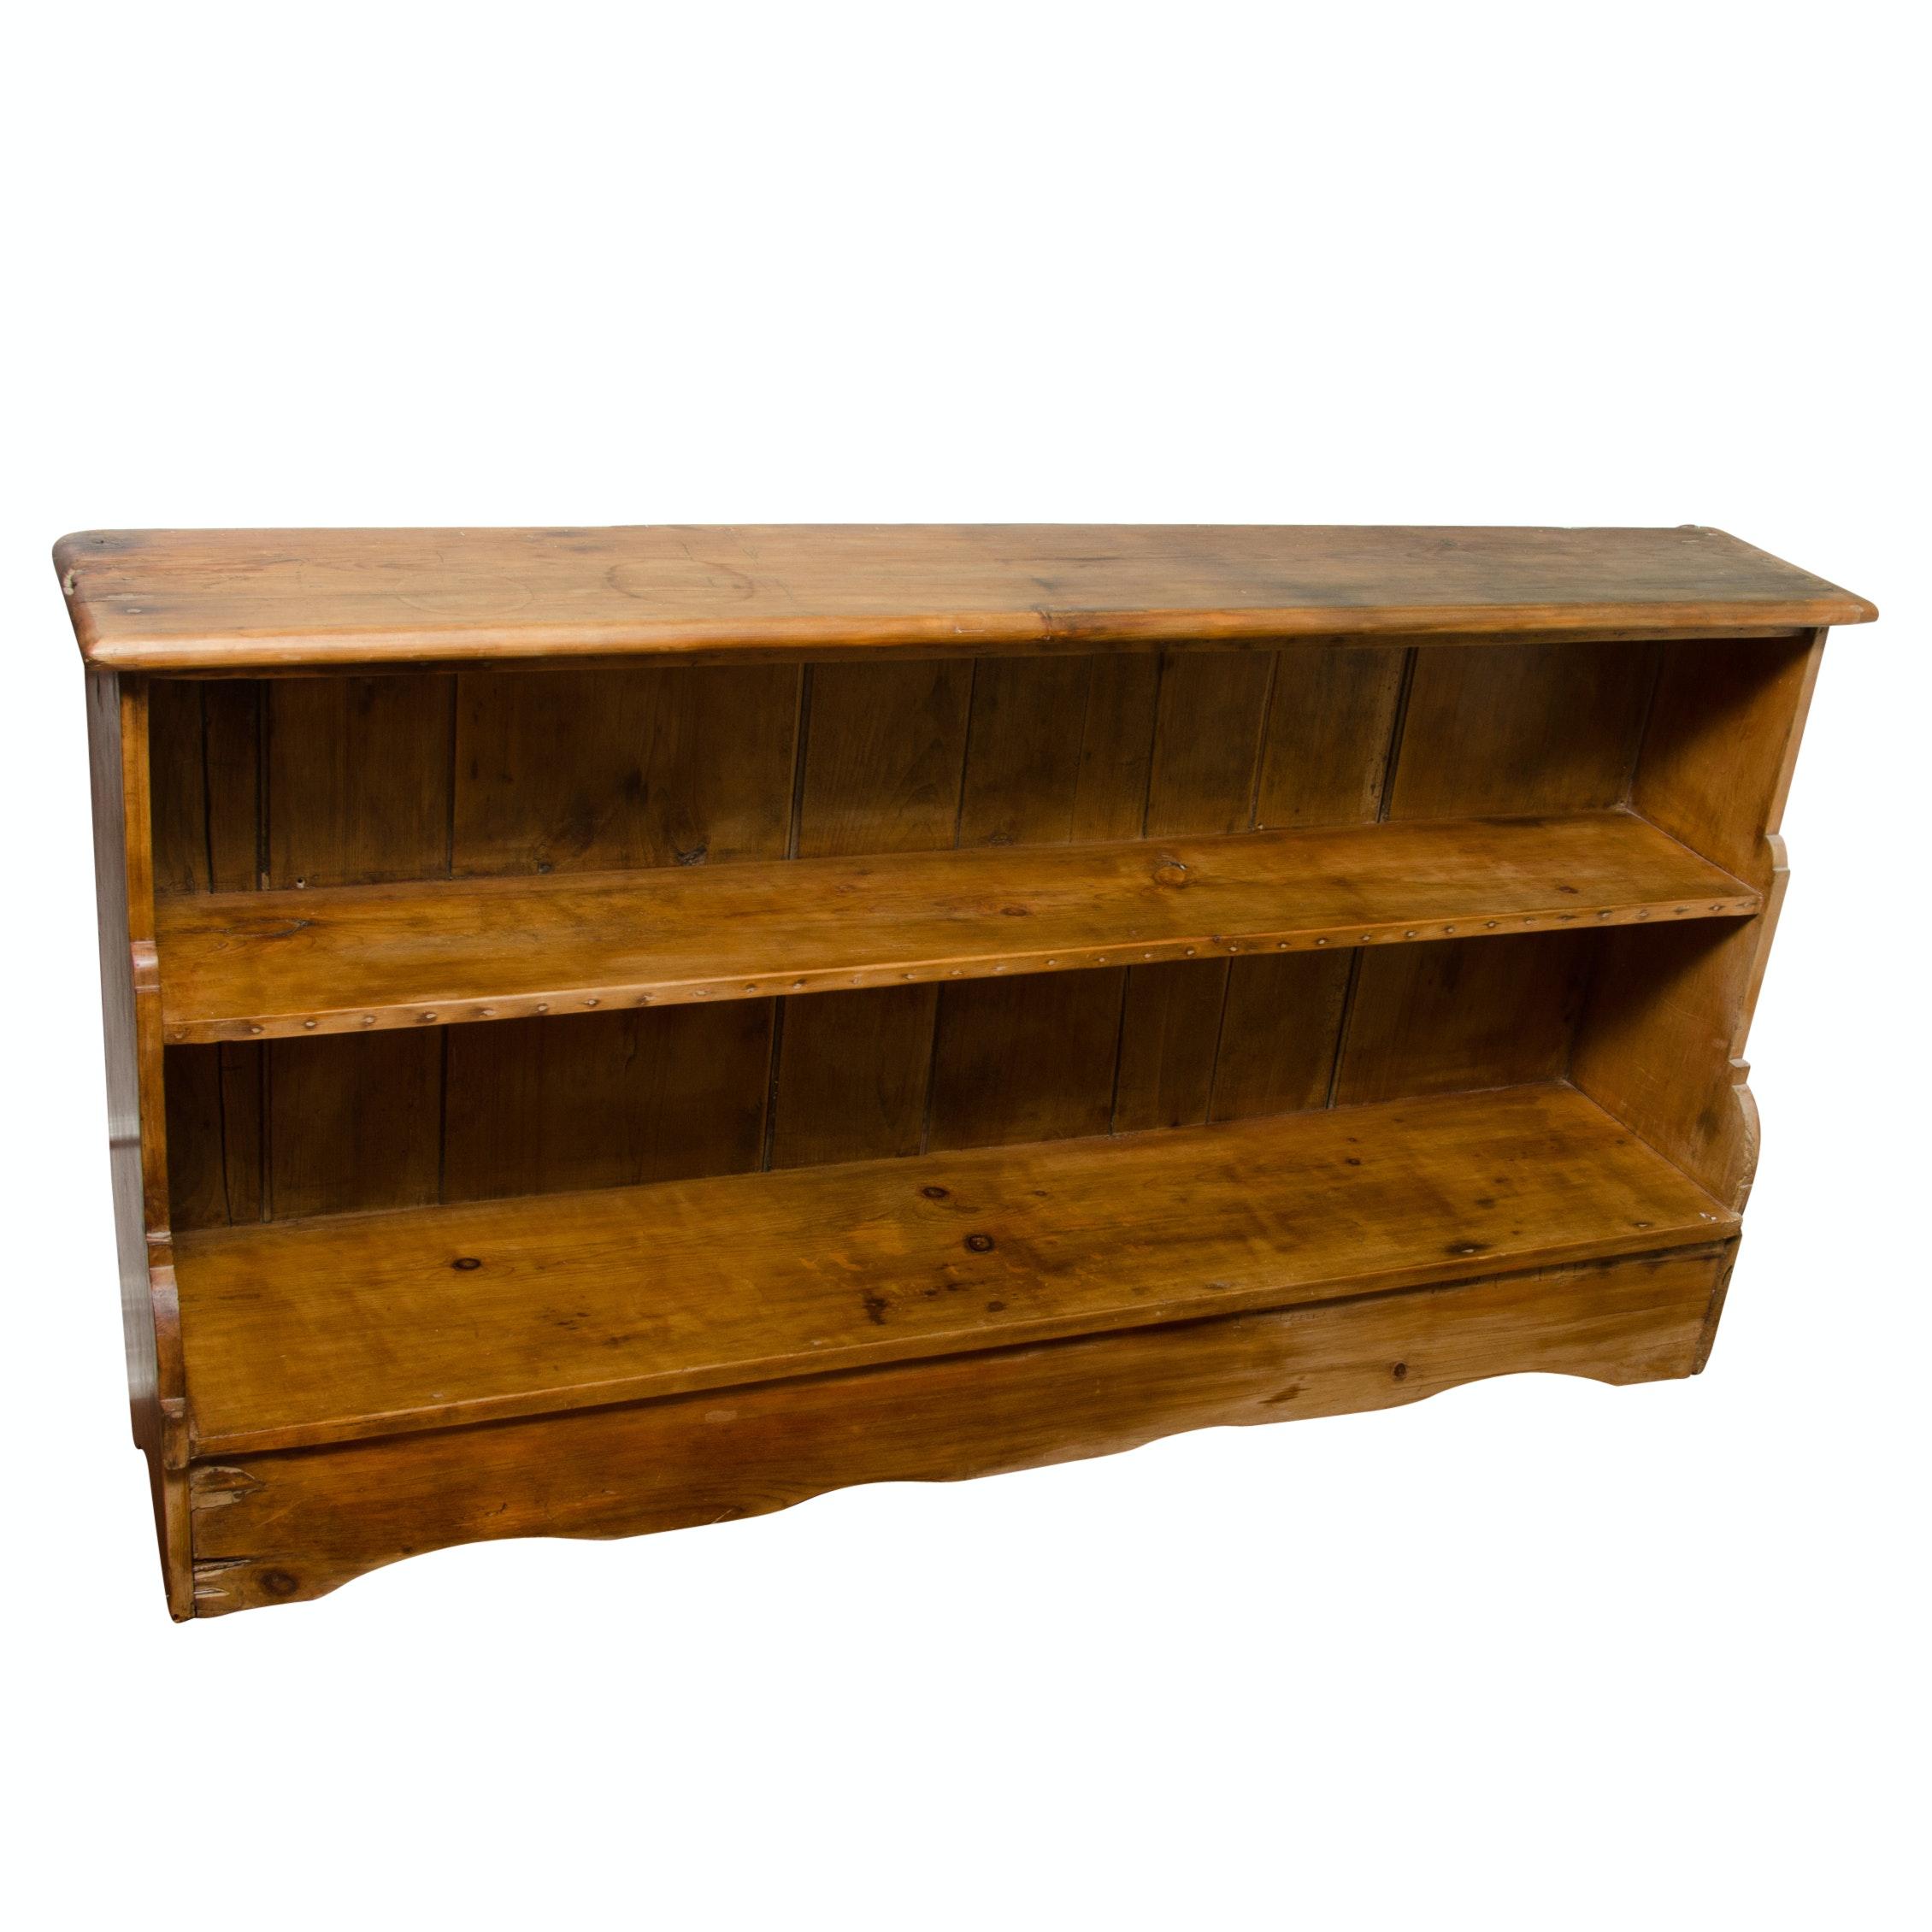 Vintage Pine Shelving Unit